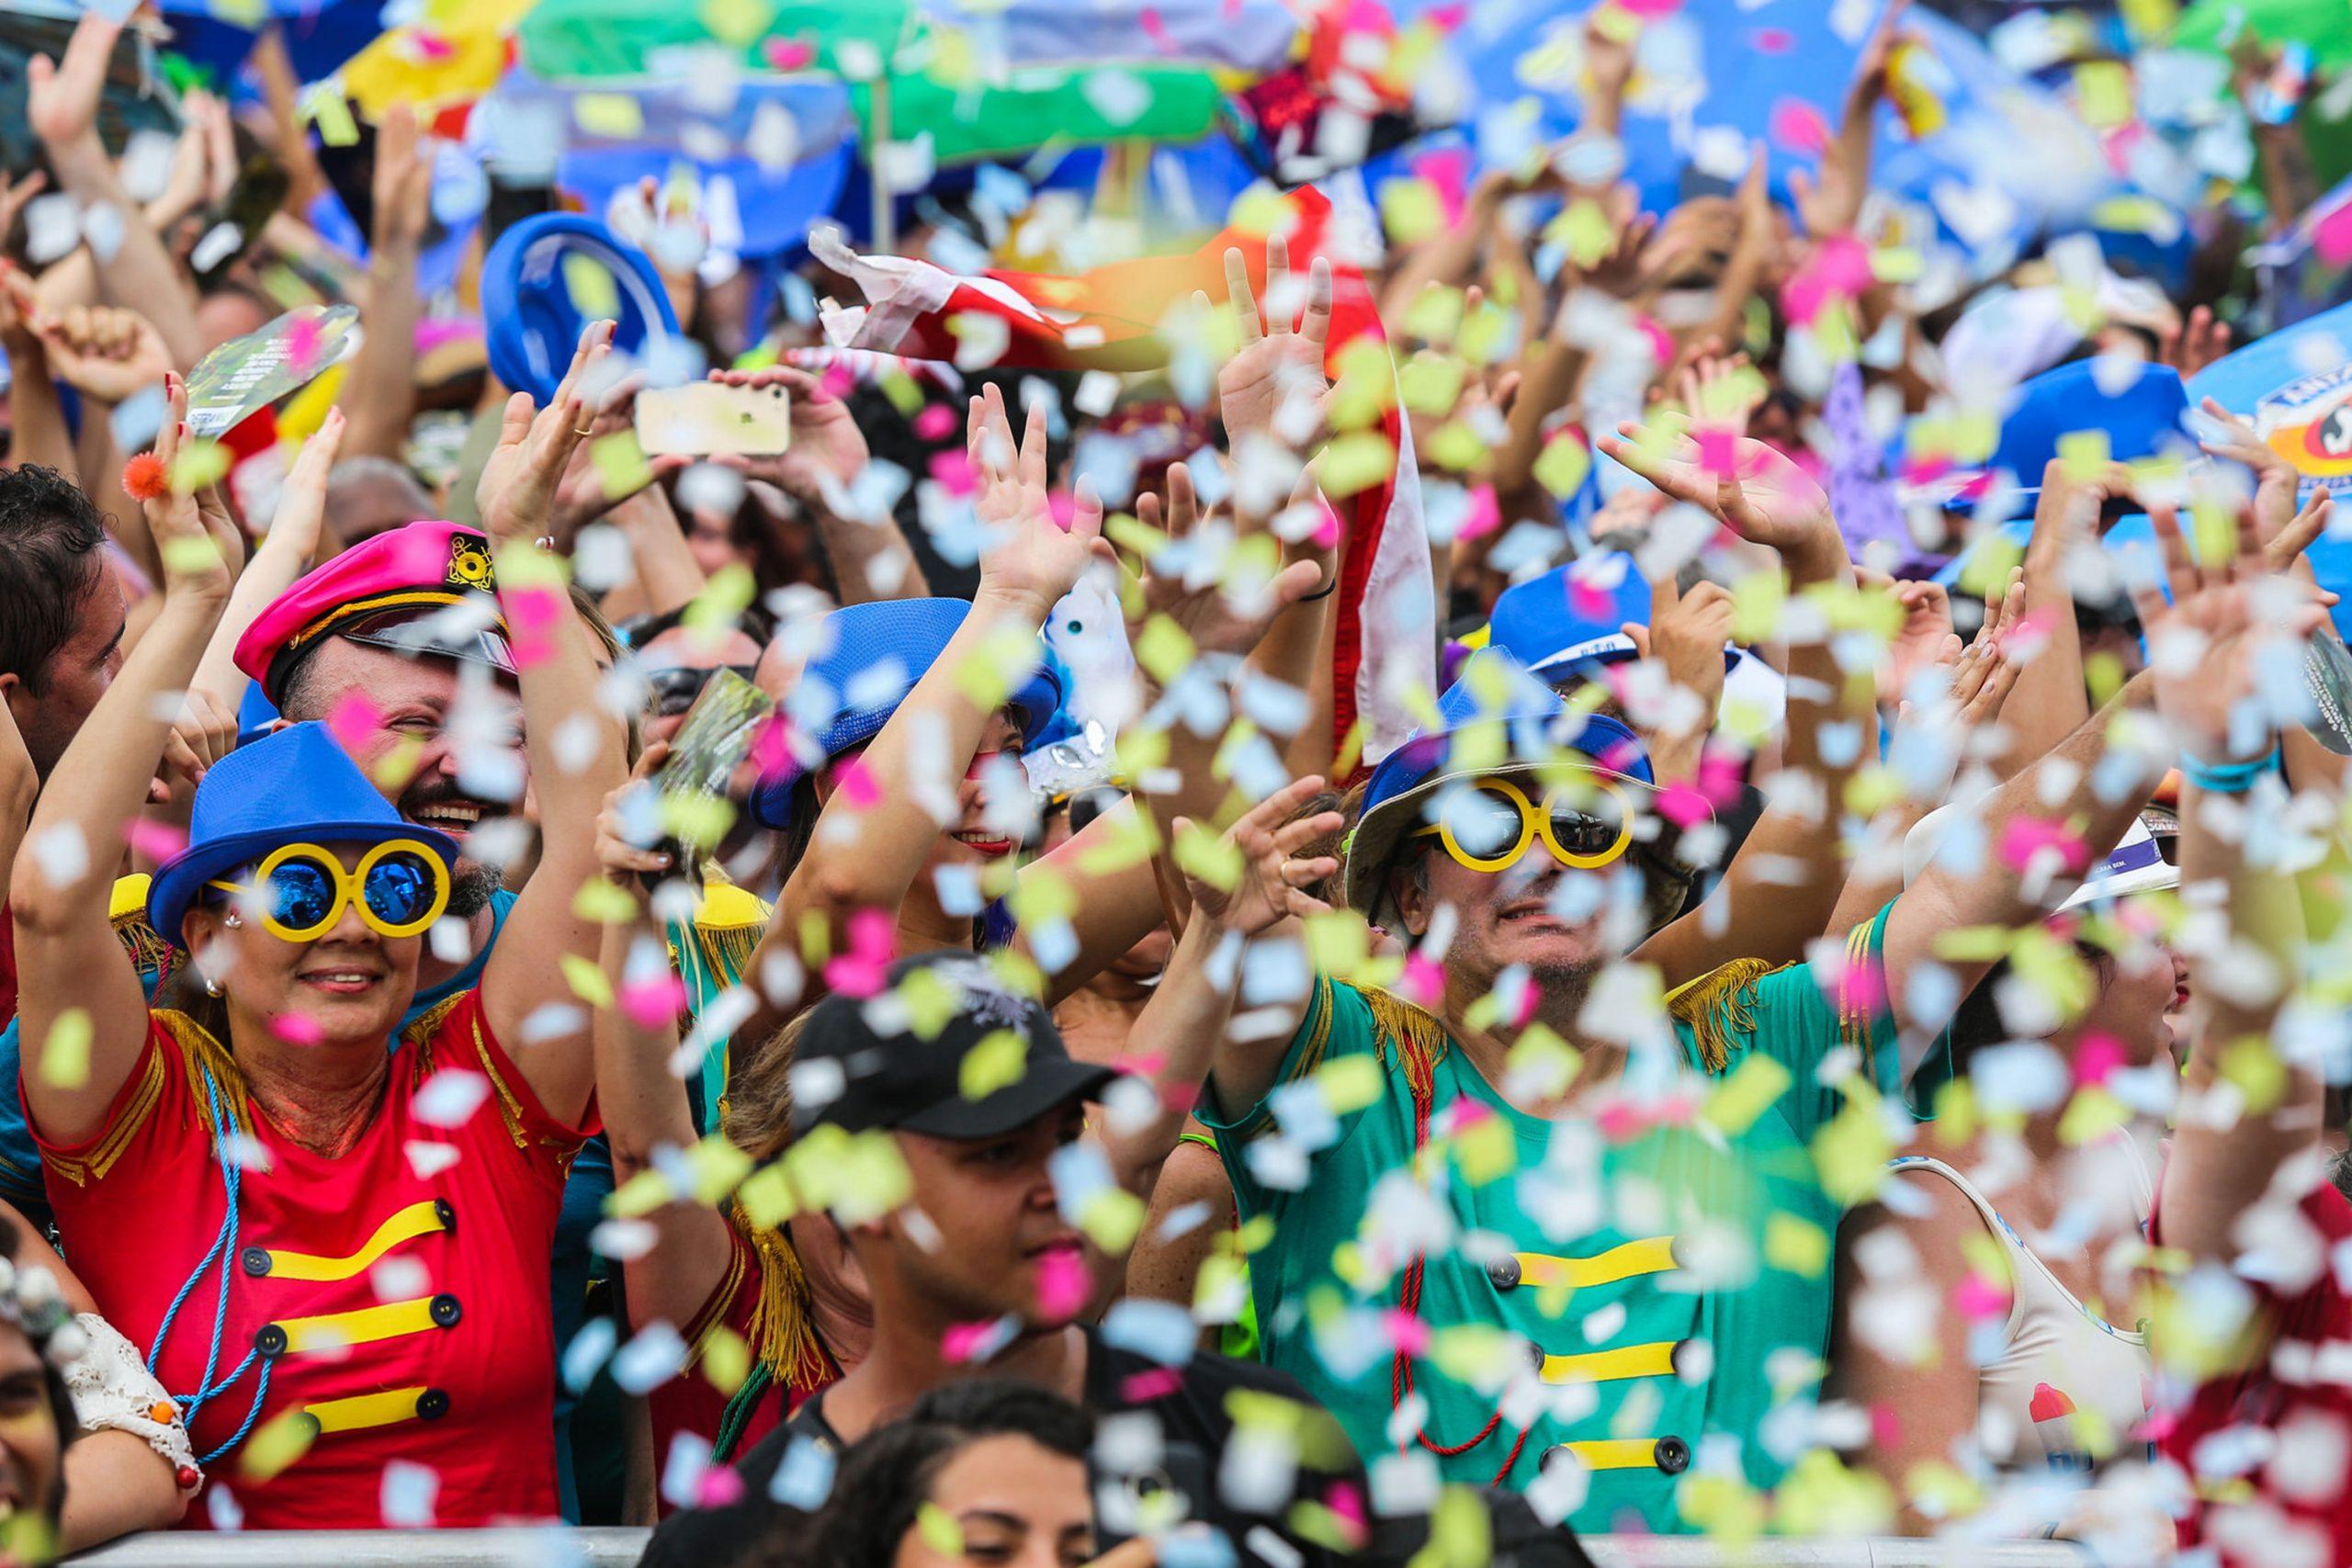 Sindilojas sugere horário especial de Carnaval para lojistas